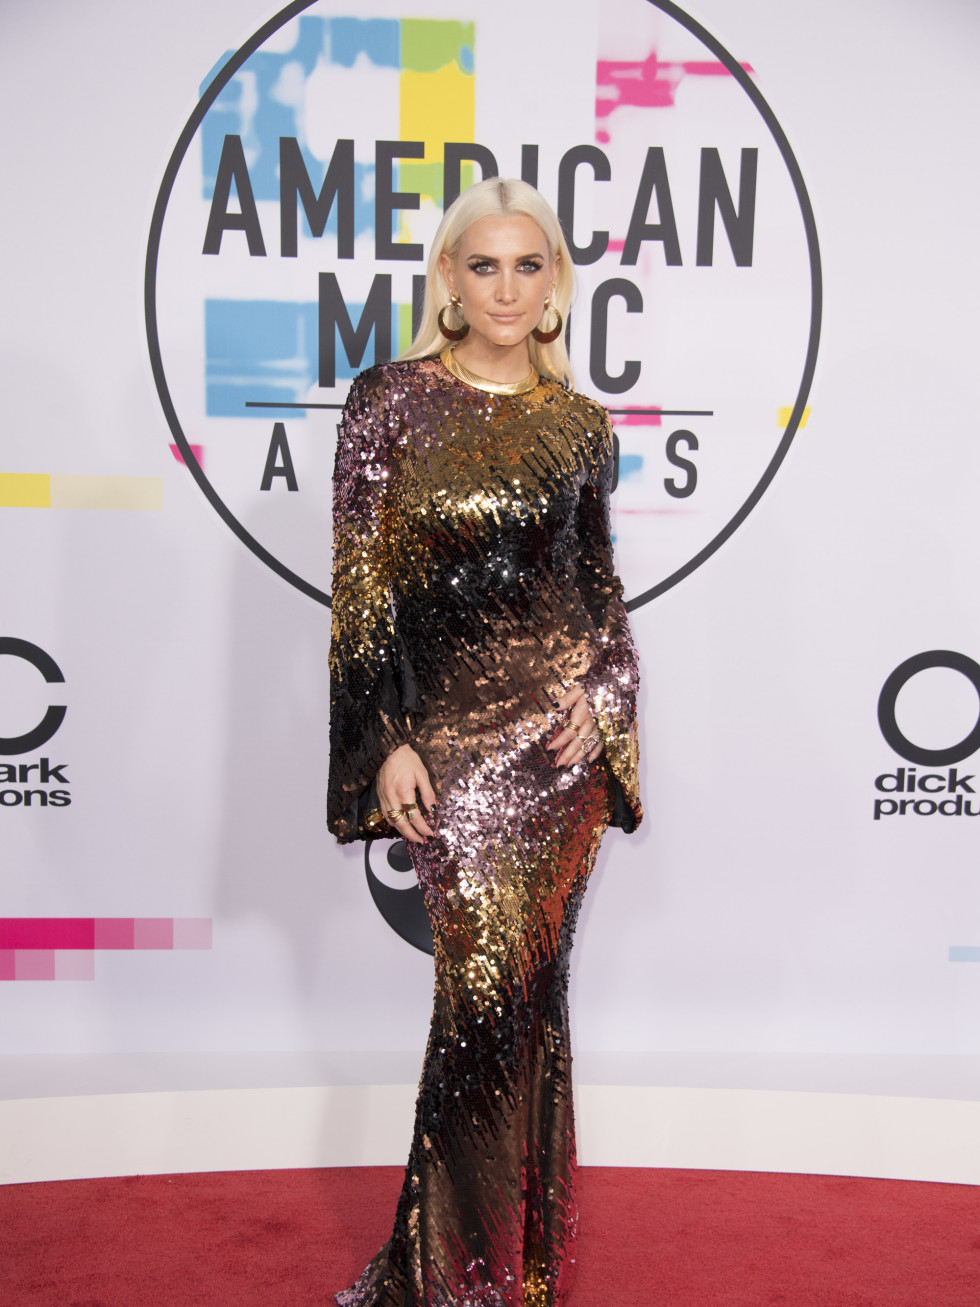 American Music Awards Ashlee Simpson